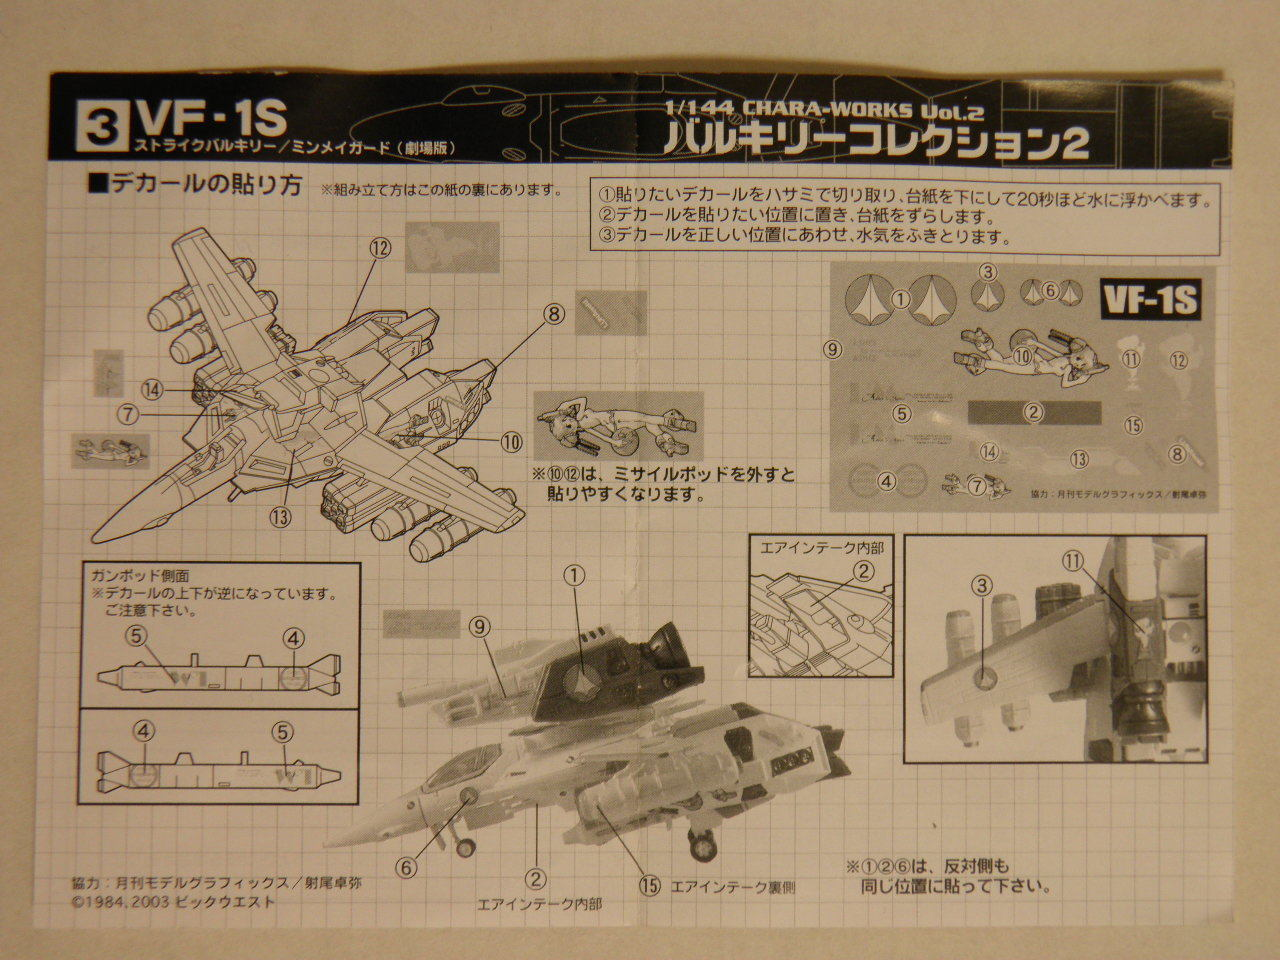 PC120140.jpg